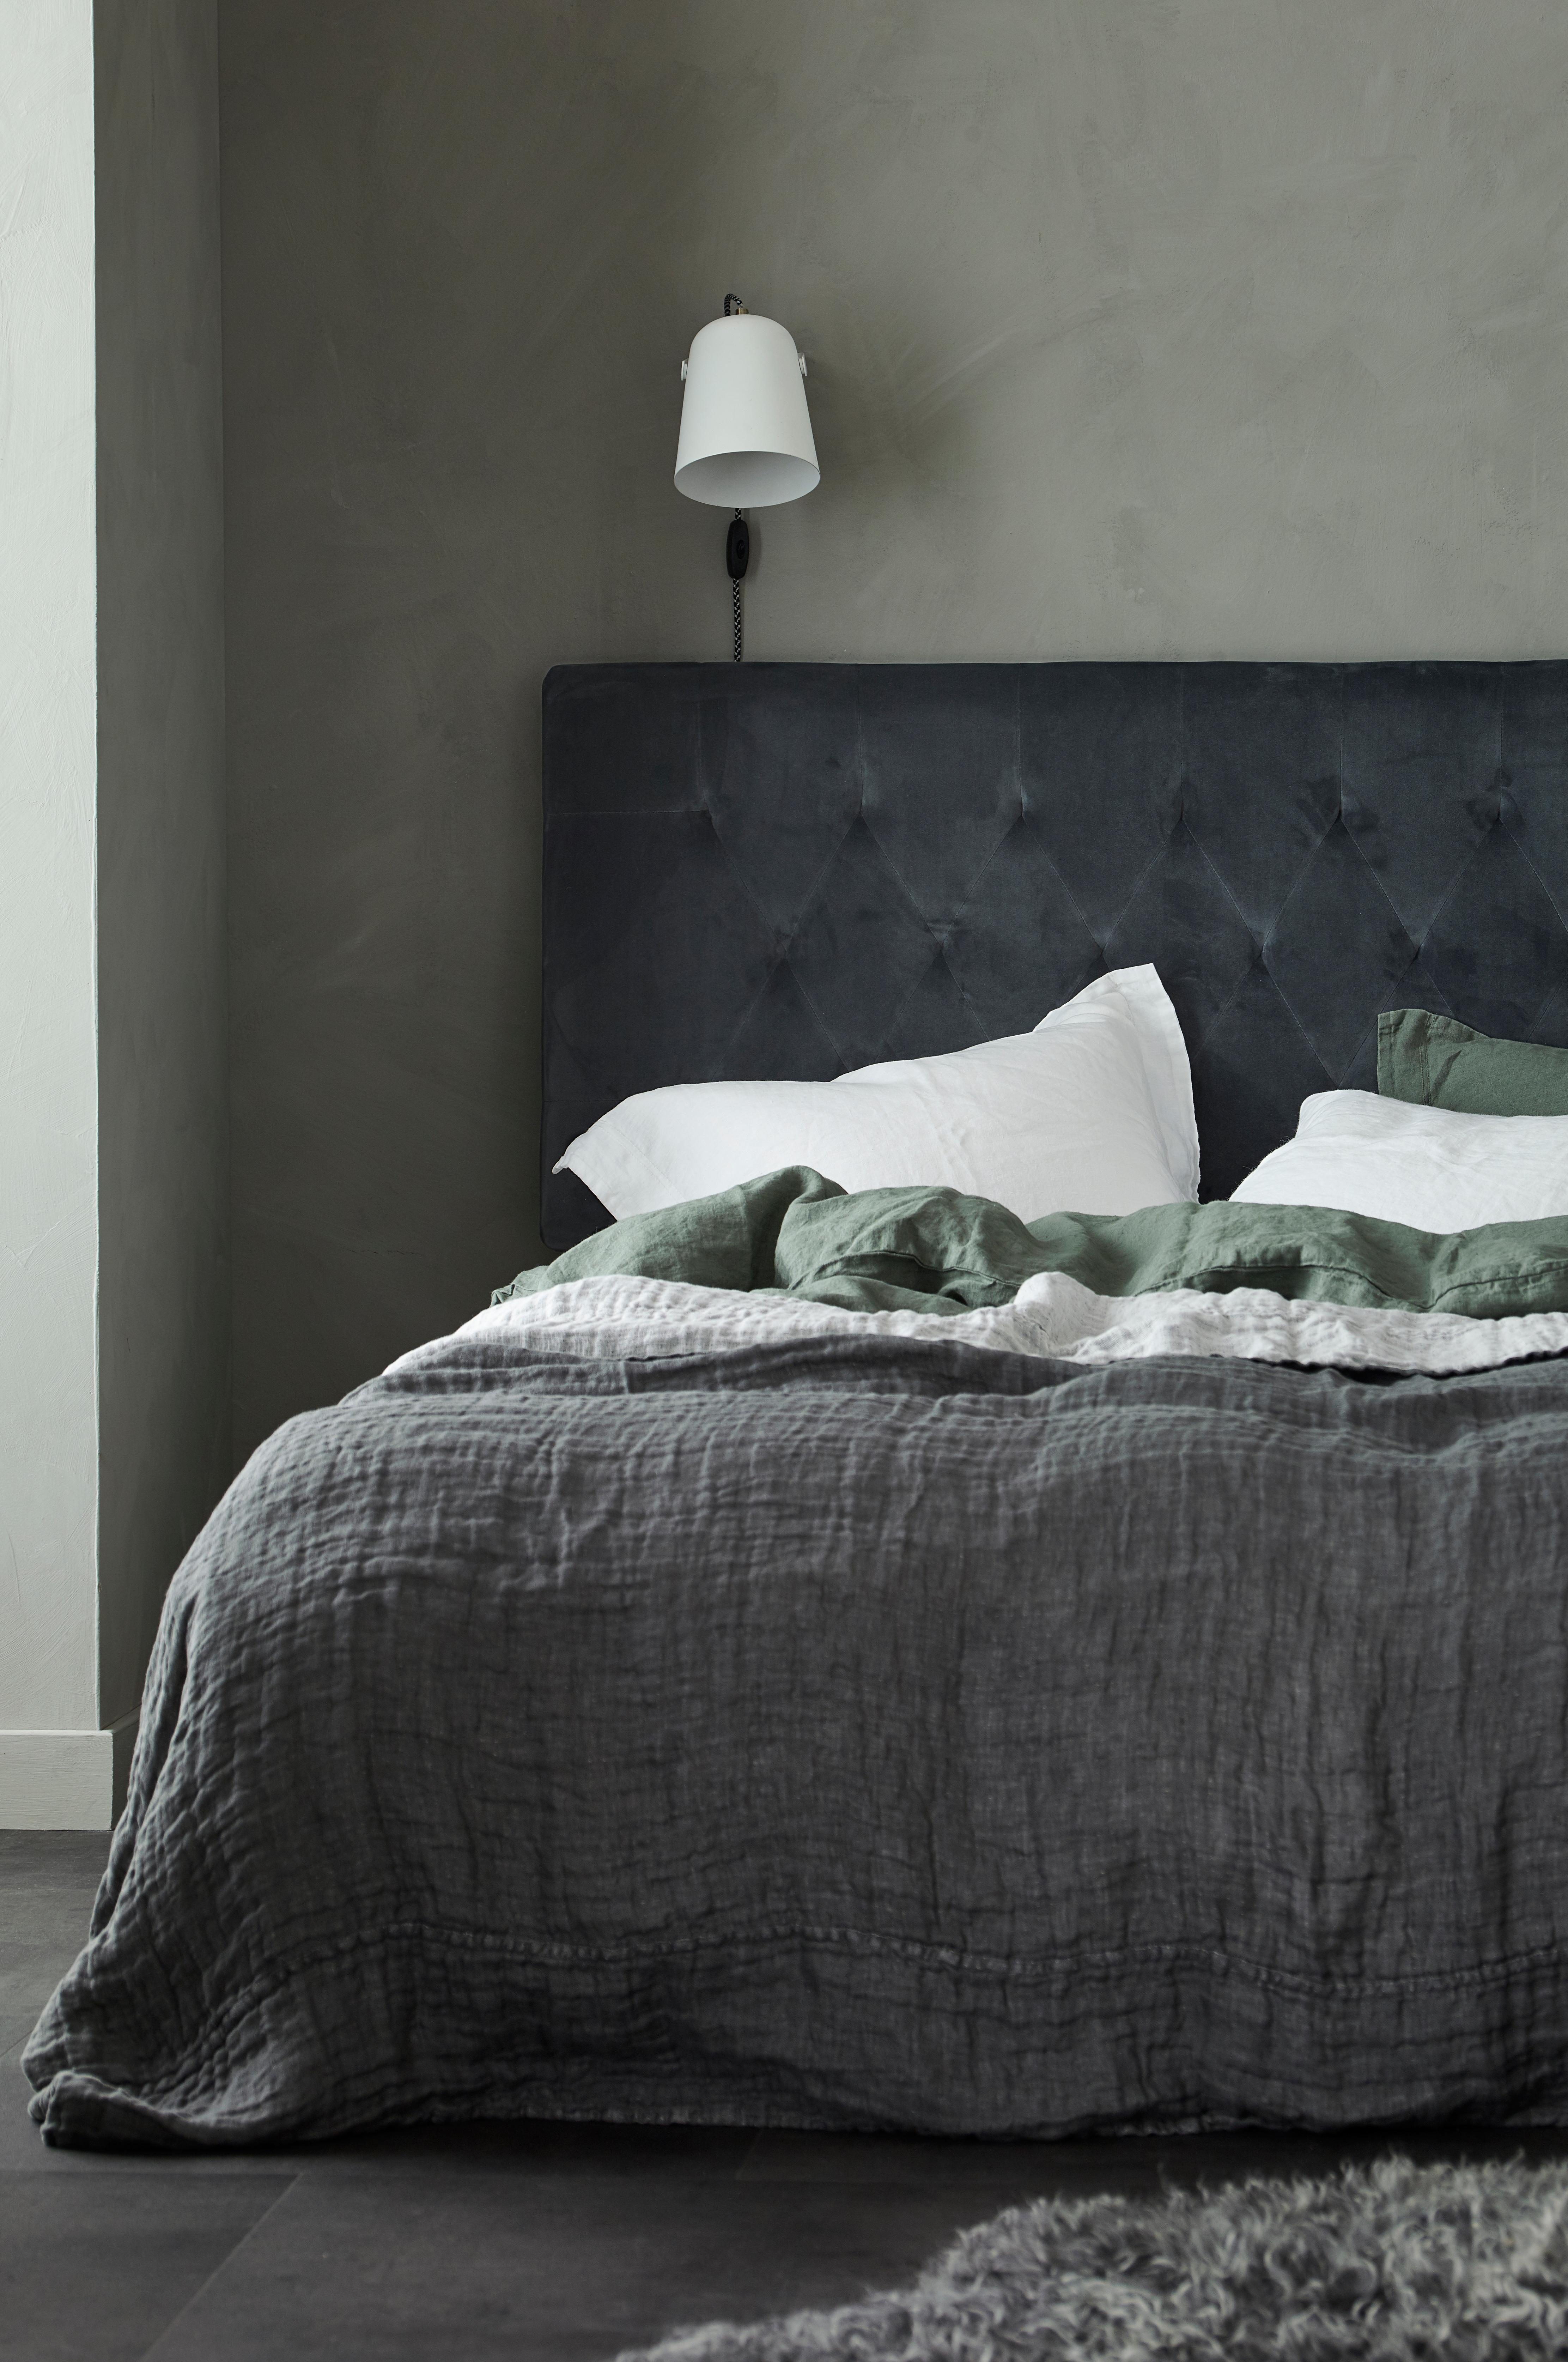 Houseboat Ideas Dream Rooms Bedrooms Design Ideas